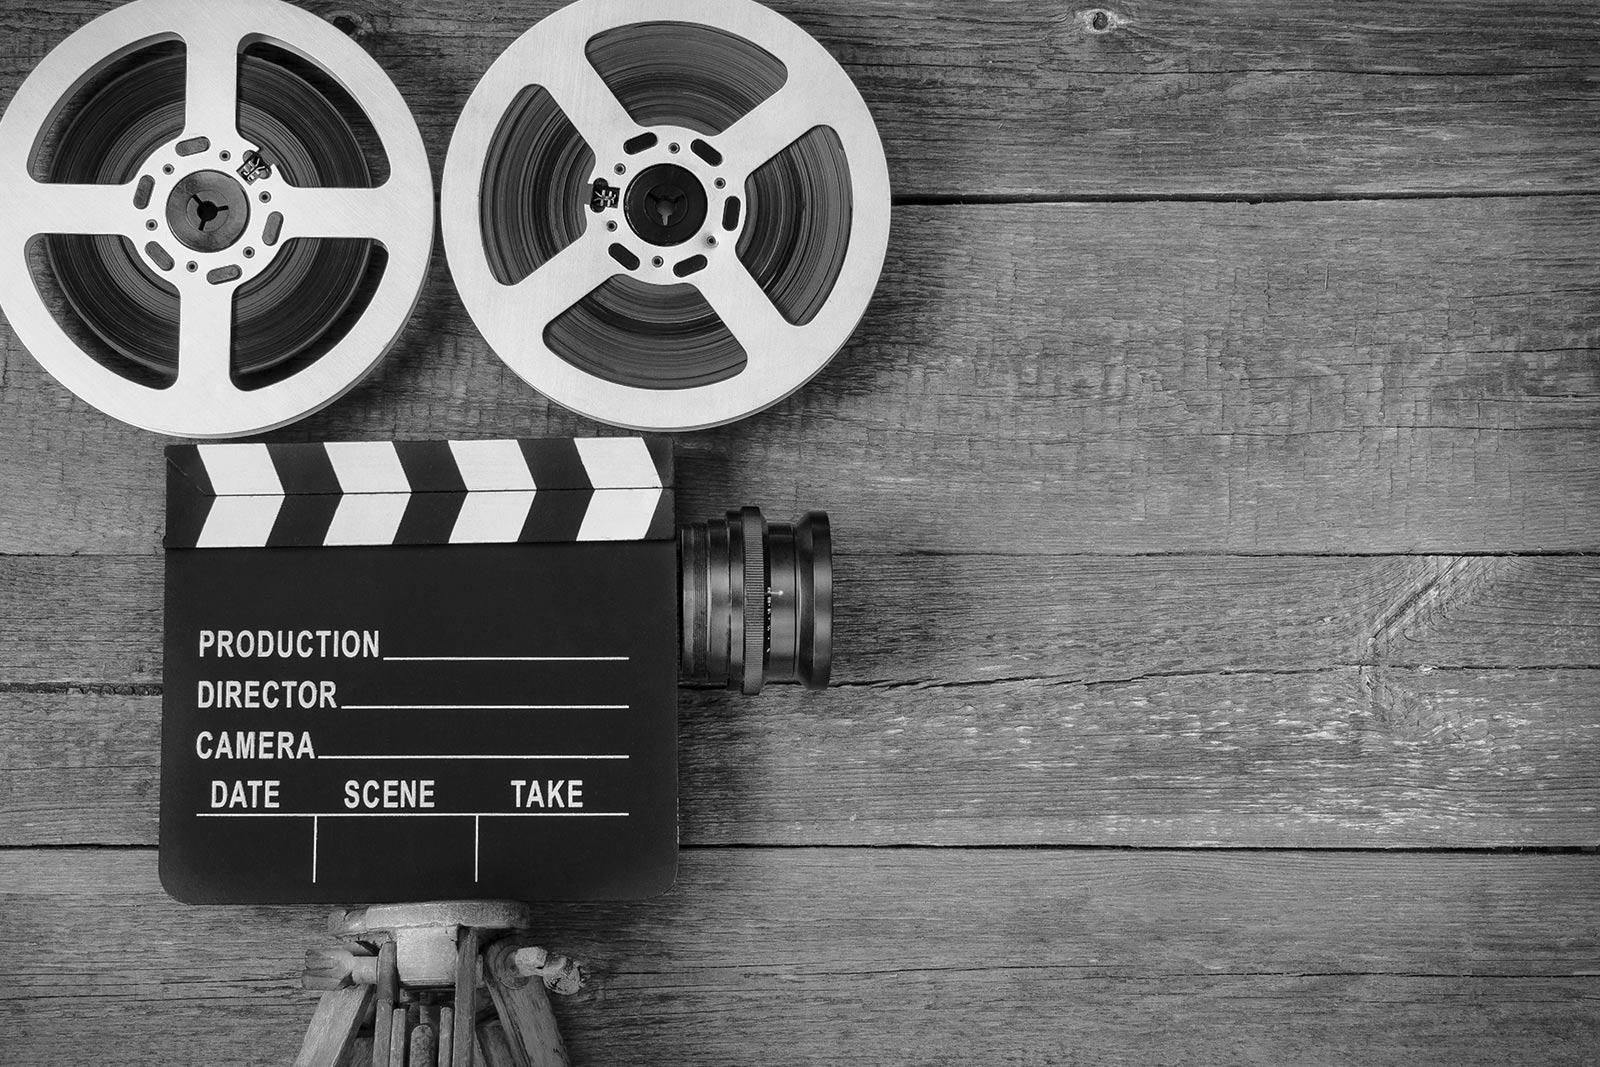 specials-slide-video-workshops-eshatklickgemacht